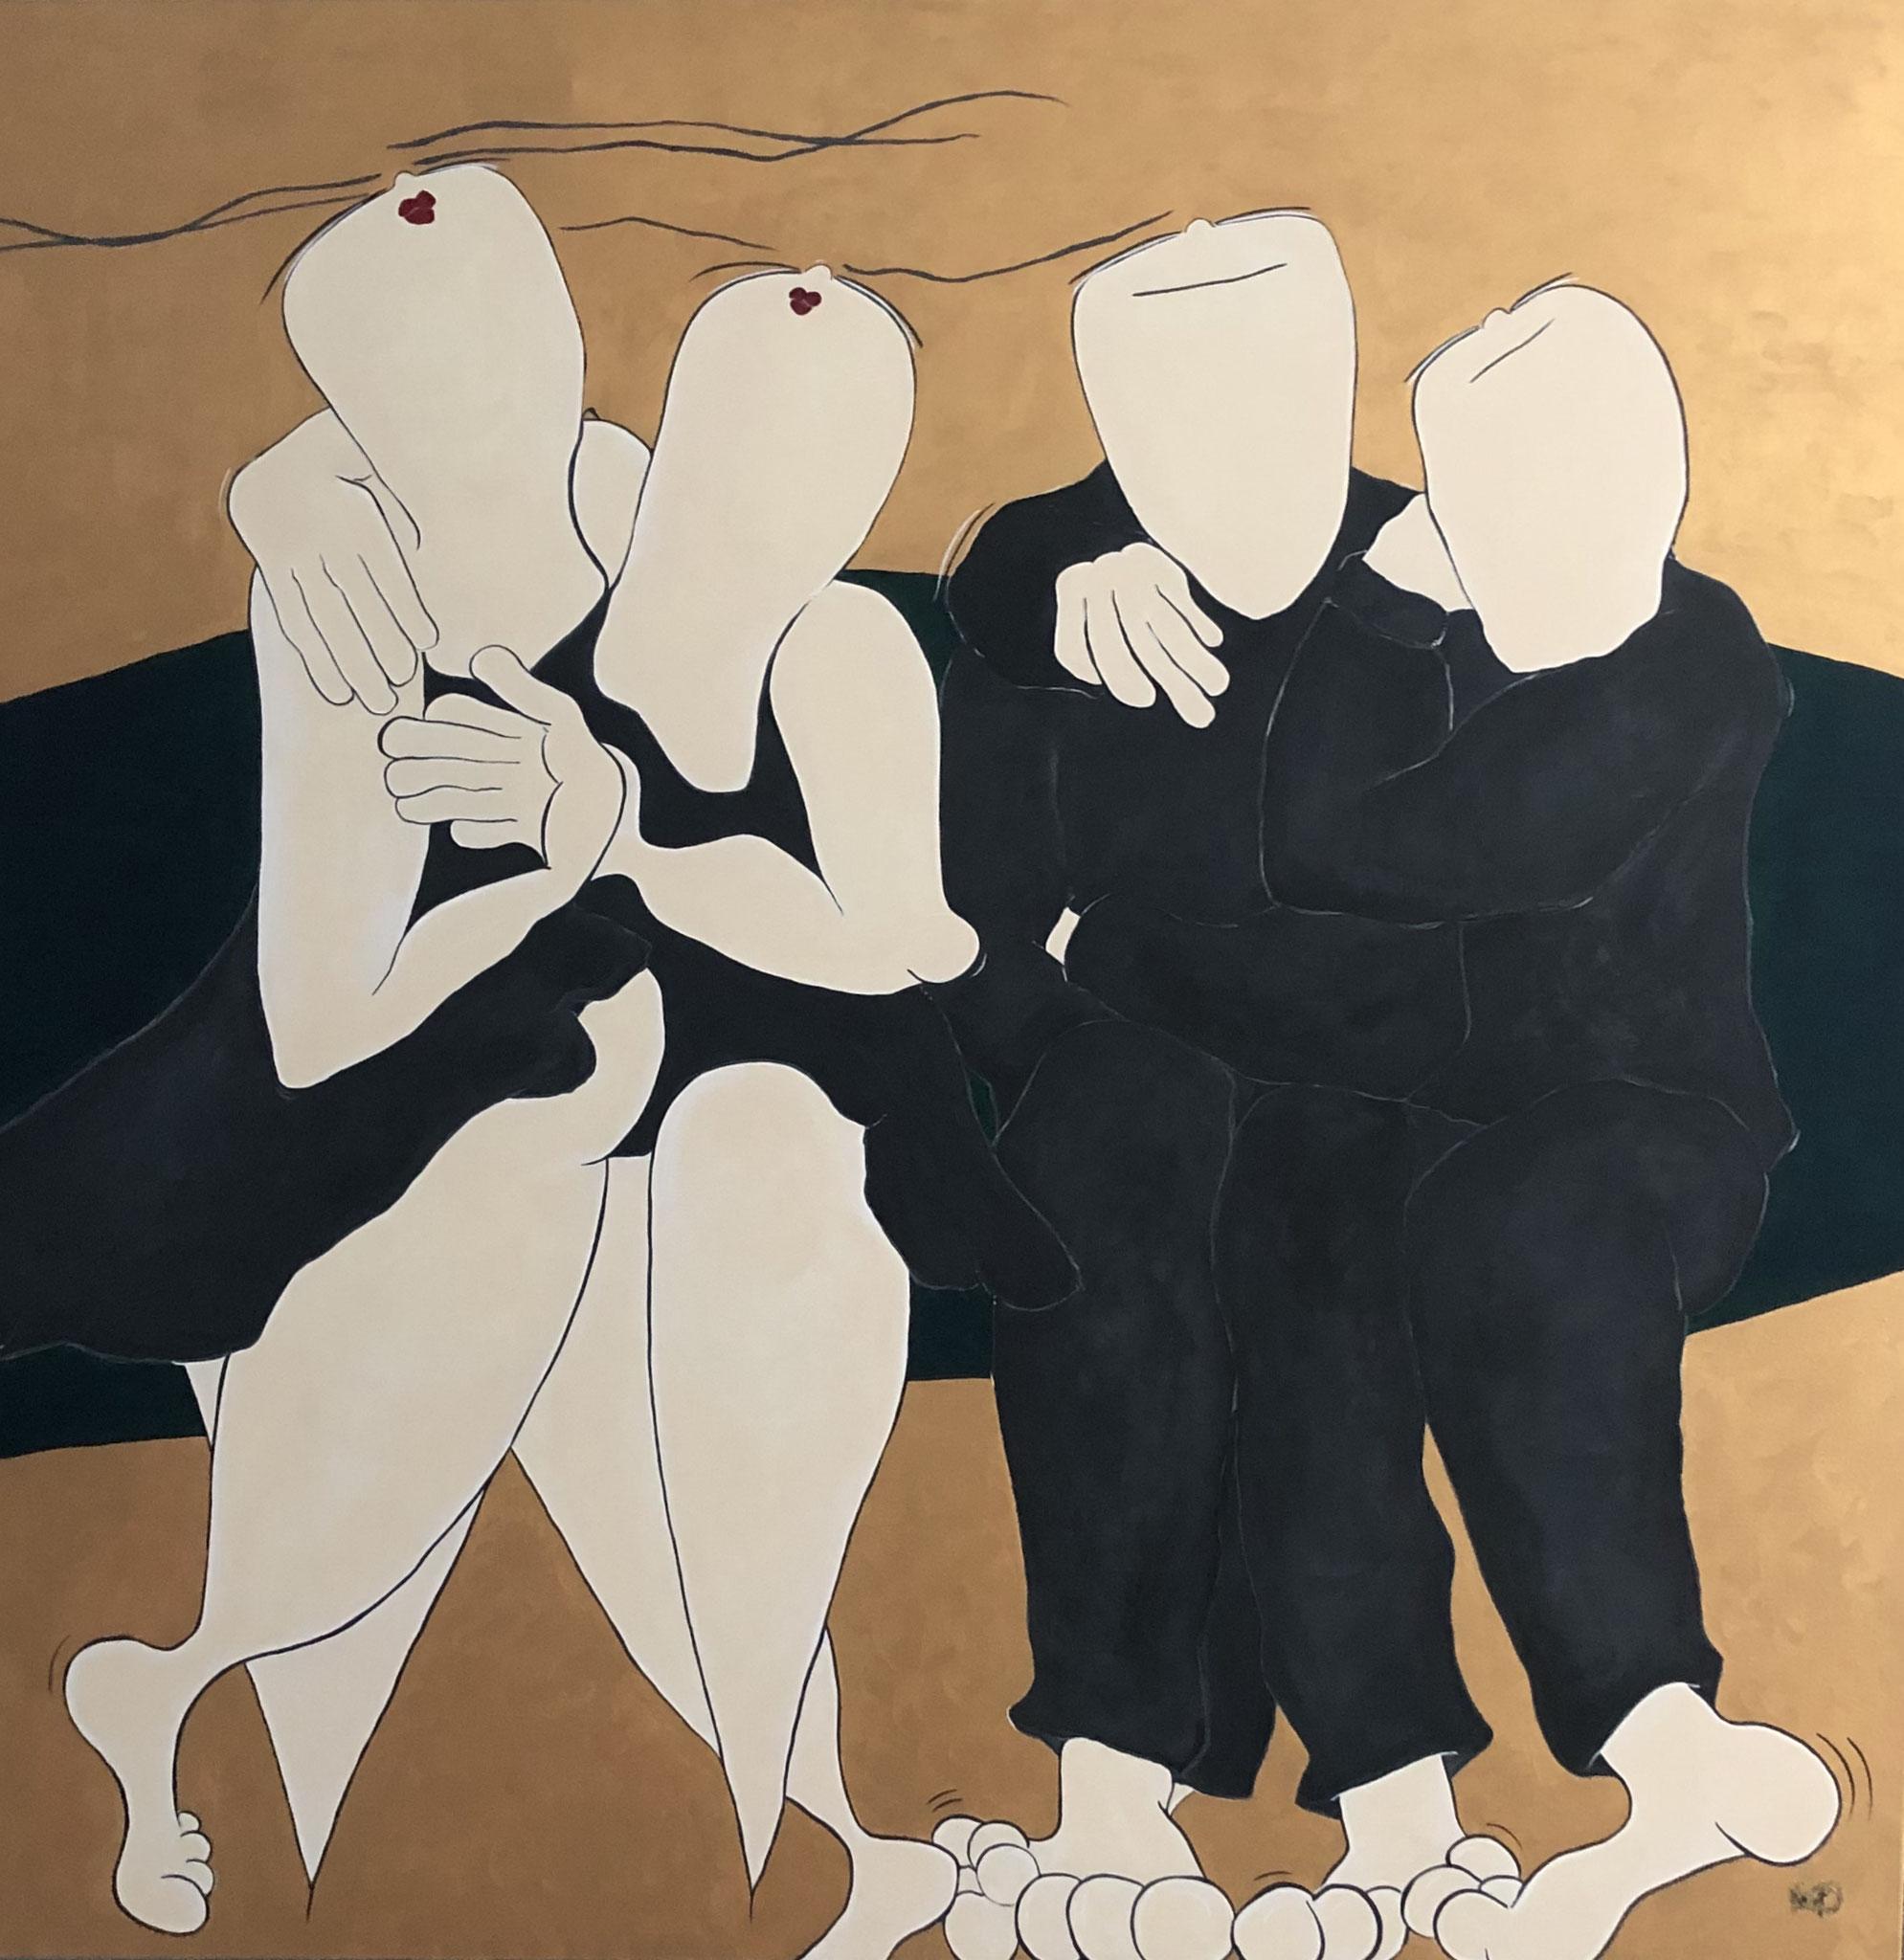 Golden future - Acryl - 150x150